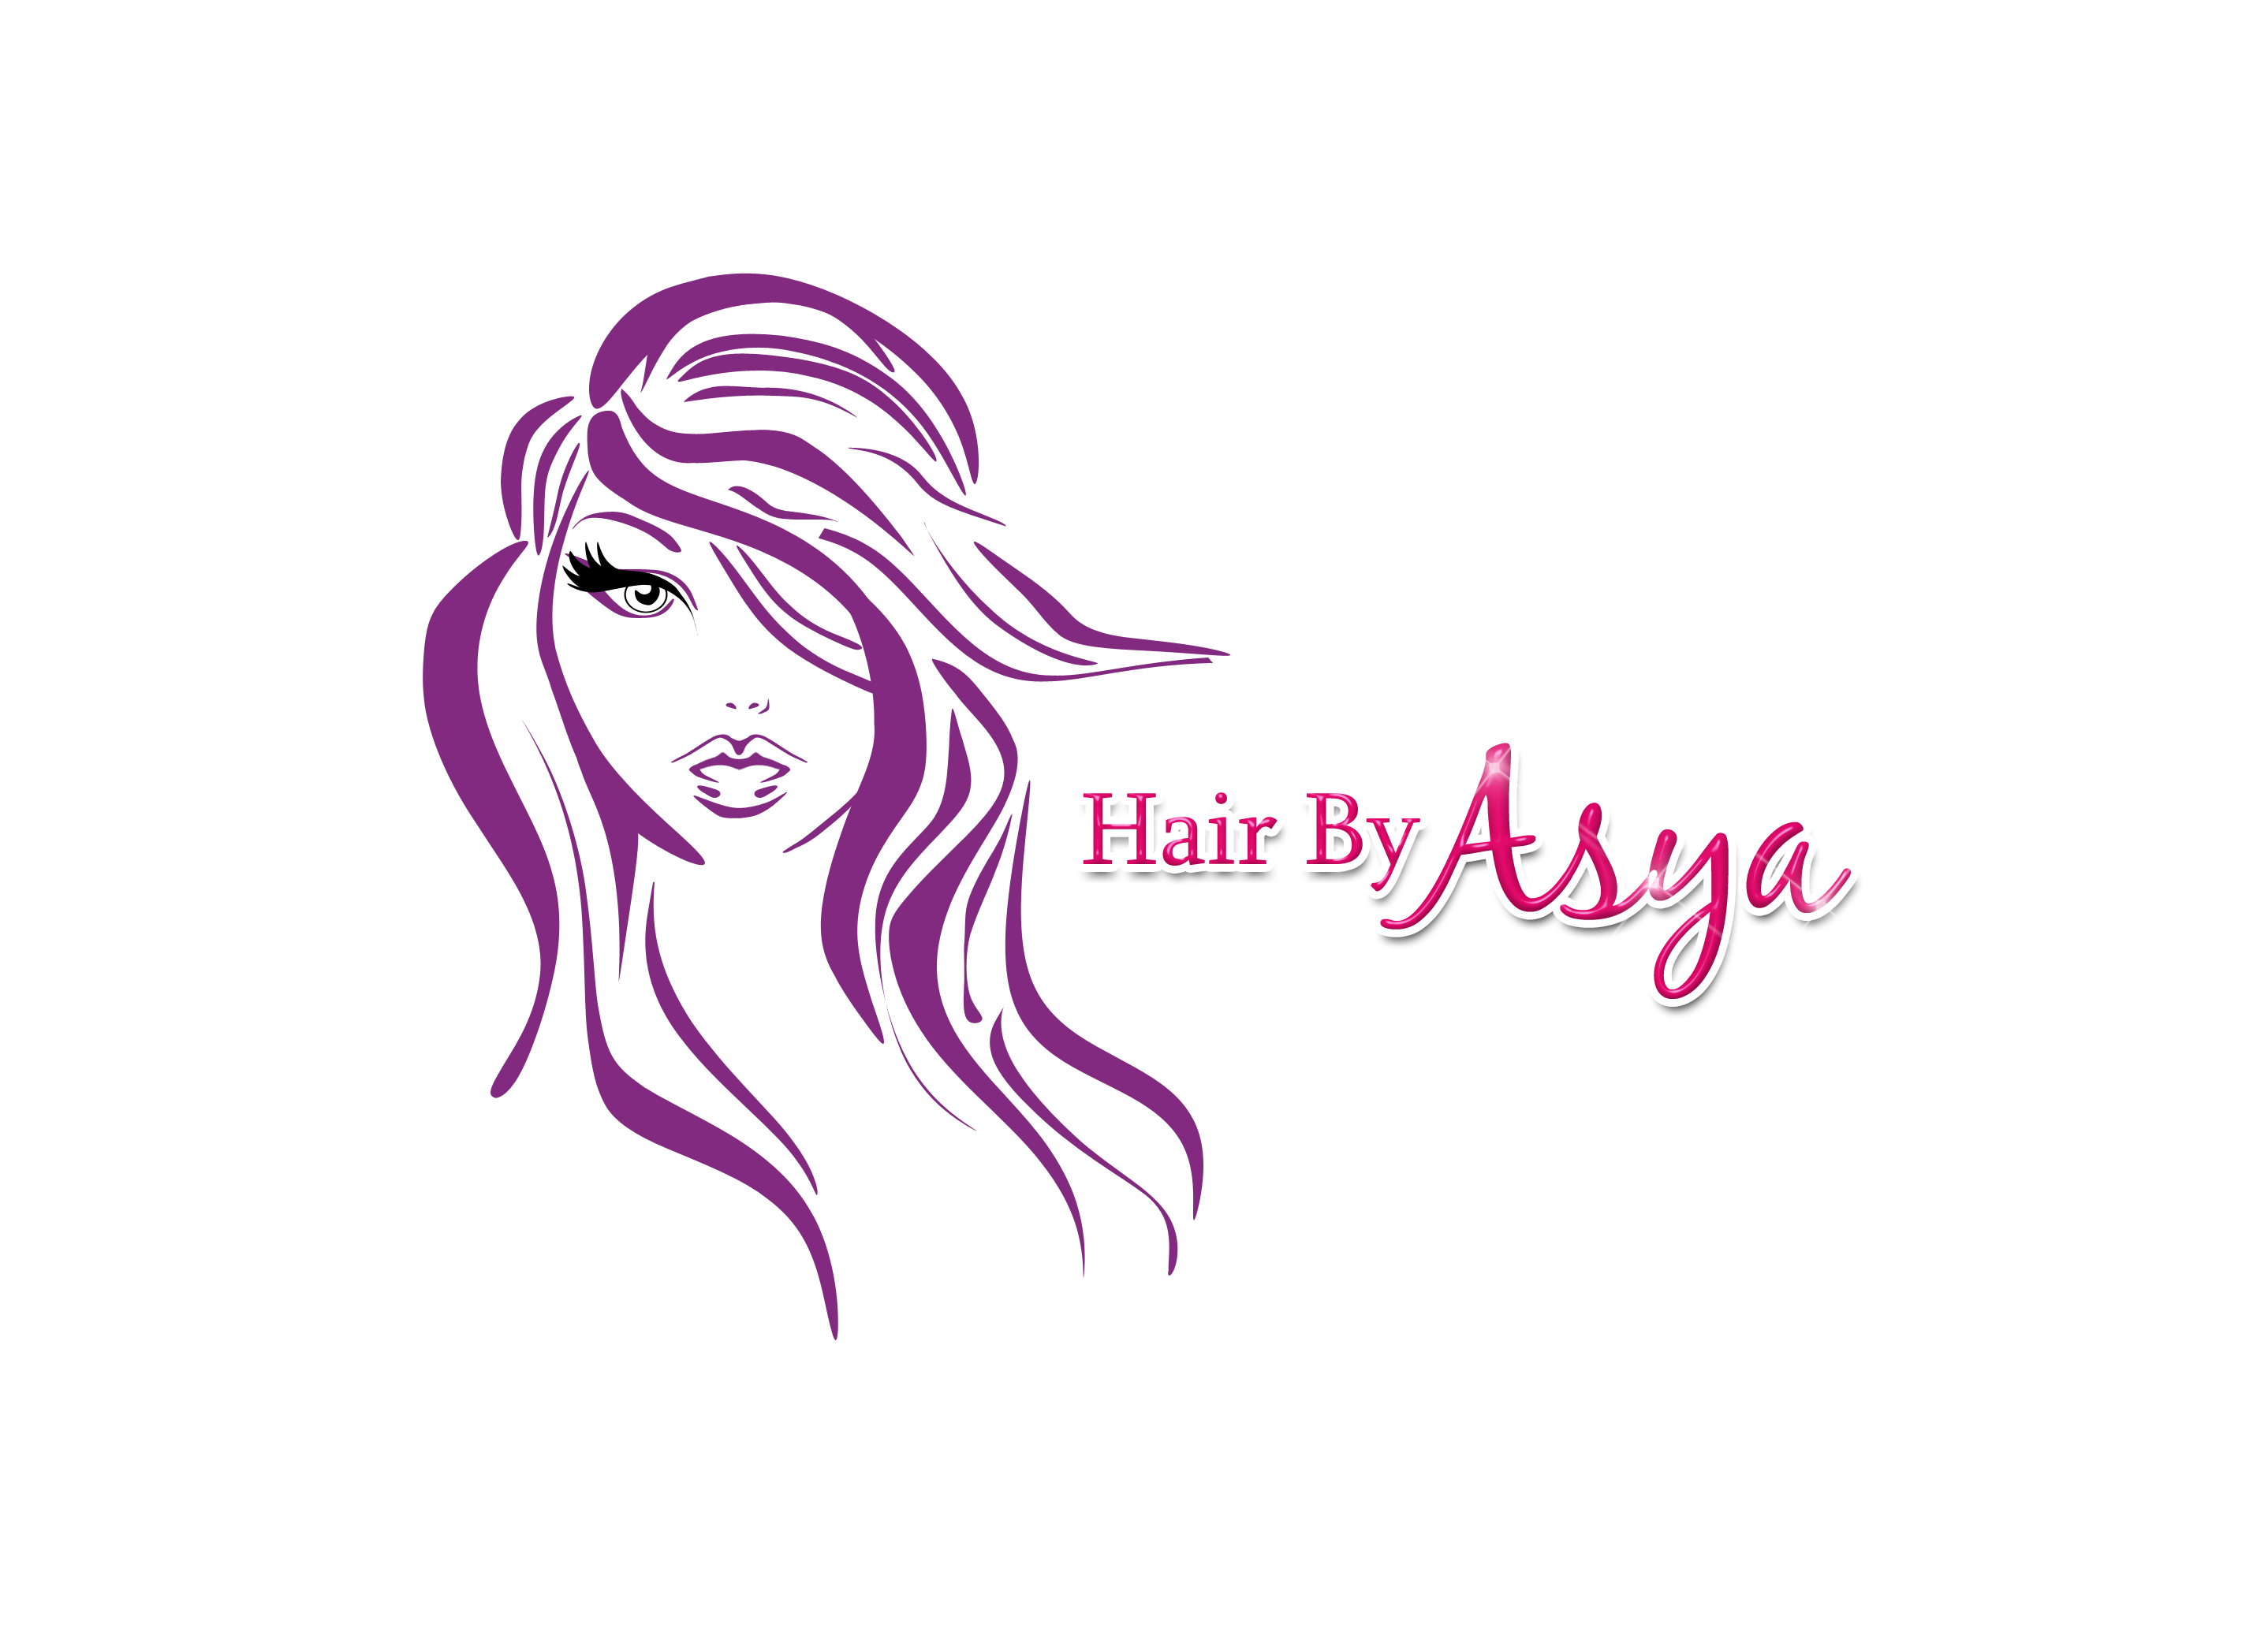 Hair By Asya Logo Paid Png 2876 2084